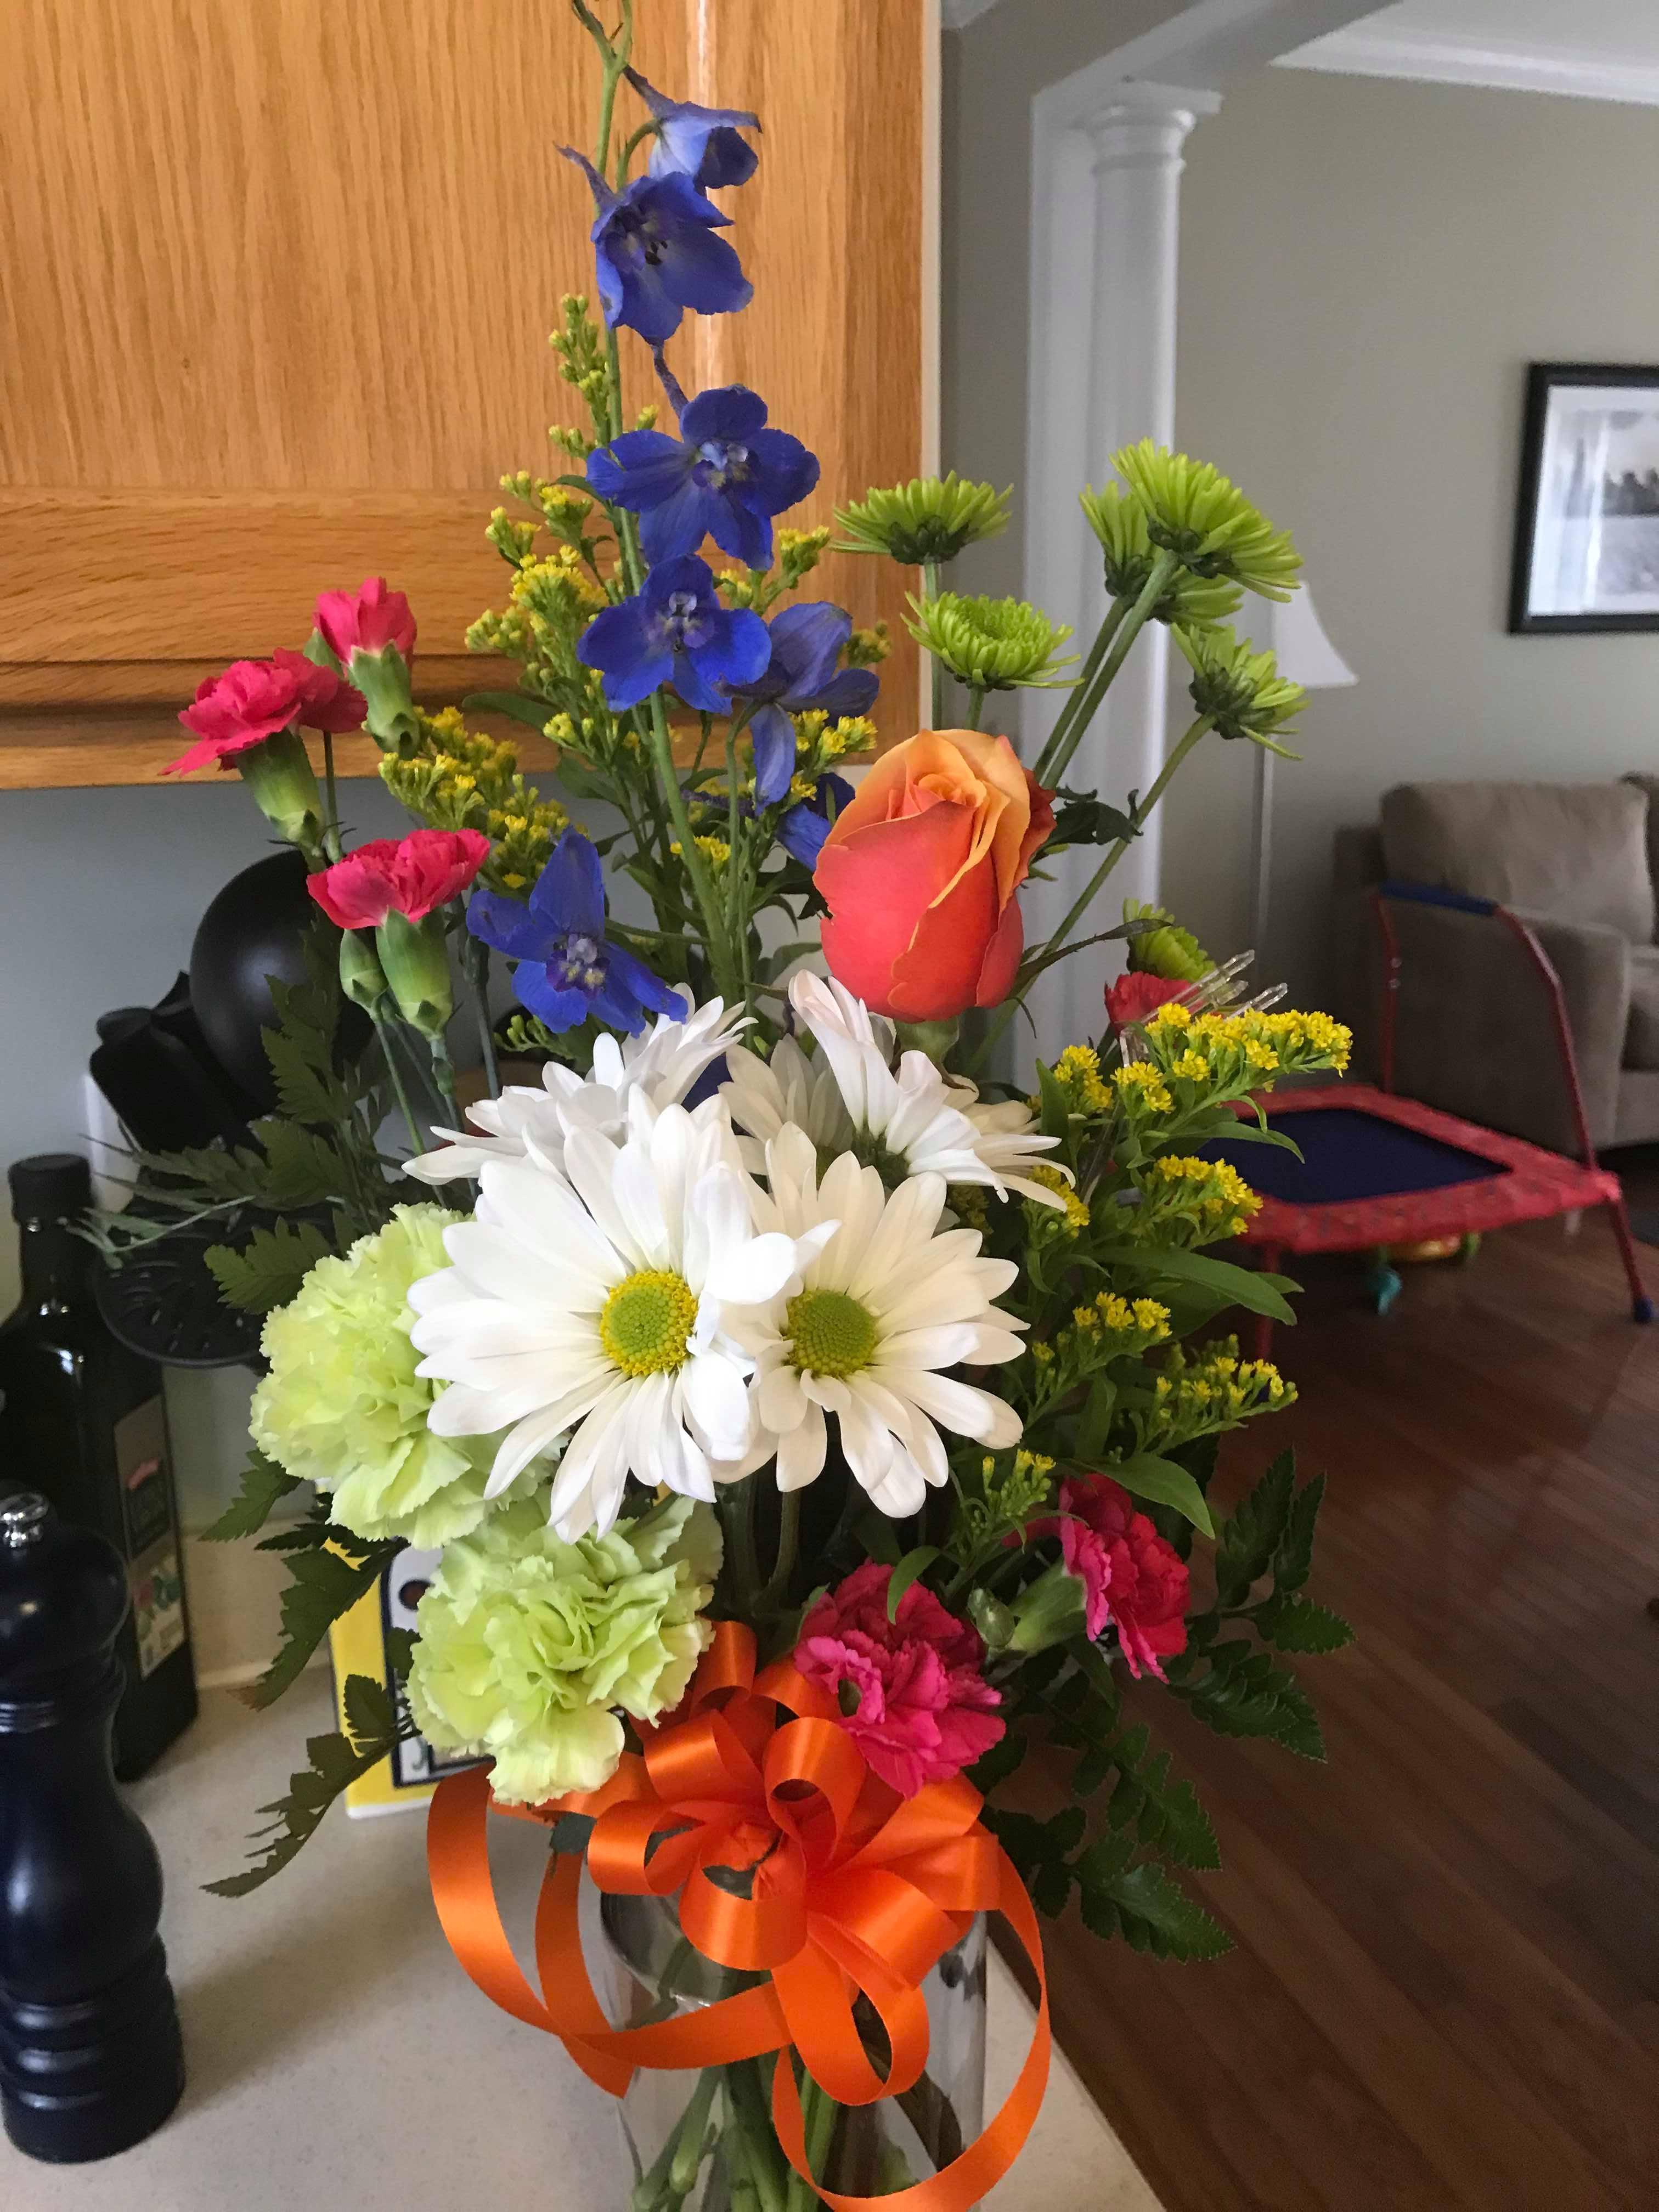 Lindsay Halpin Pualoa Flowers HVAC